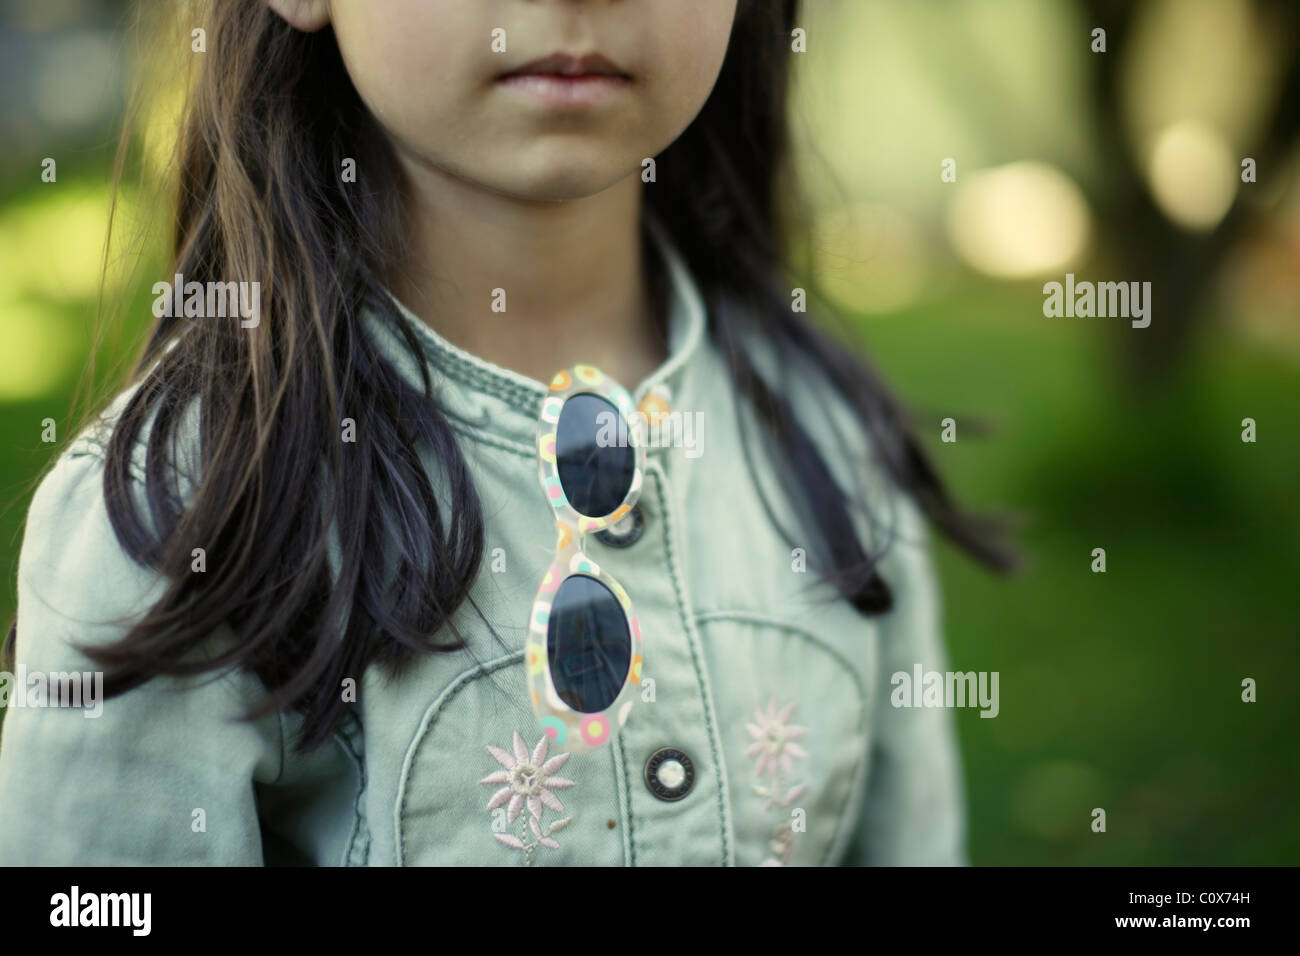 Rapariga no casaco de brim com óculos Imagens de Stock